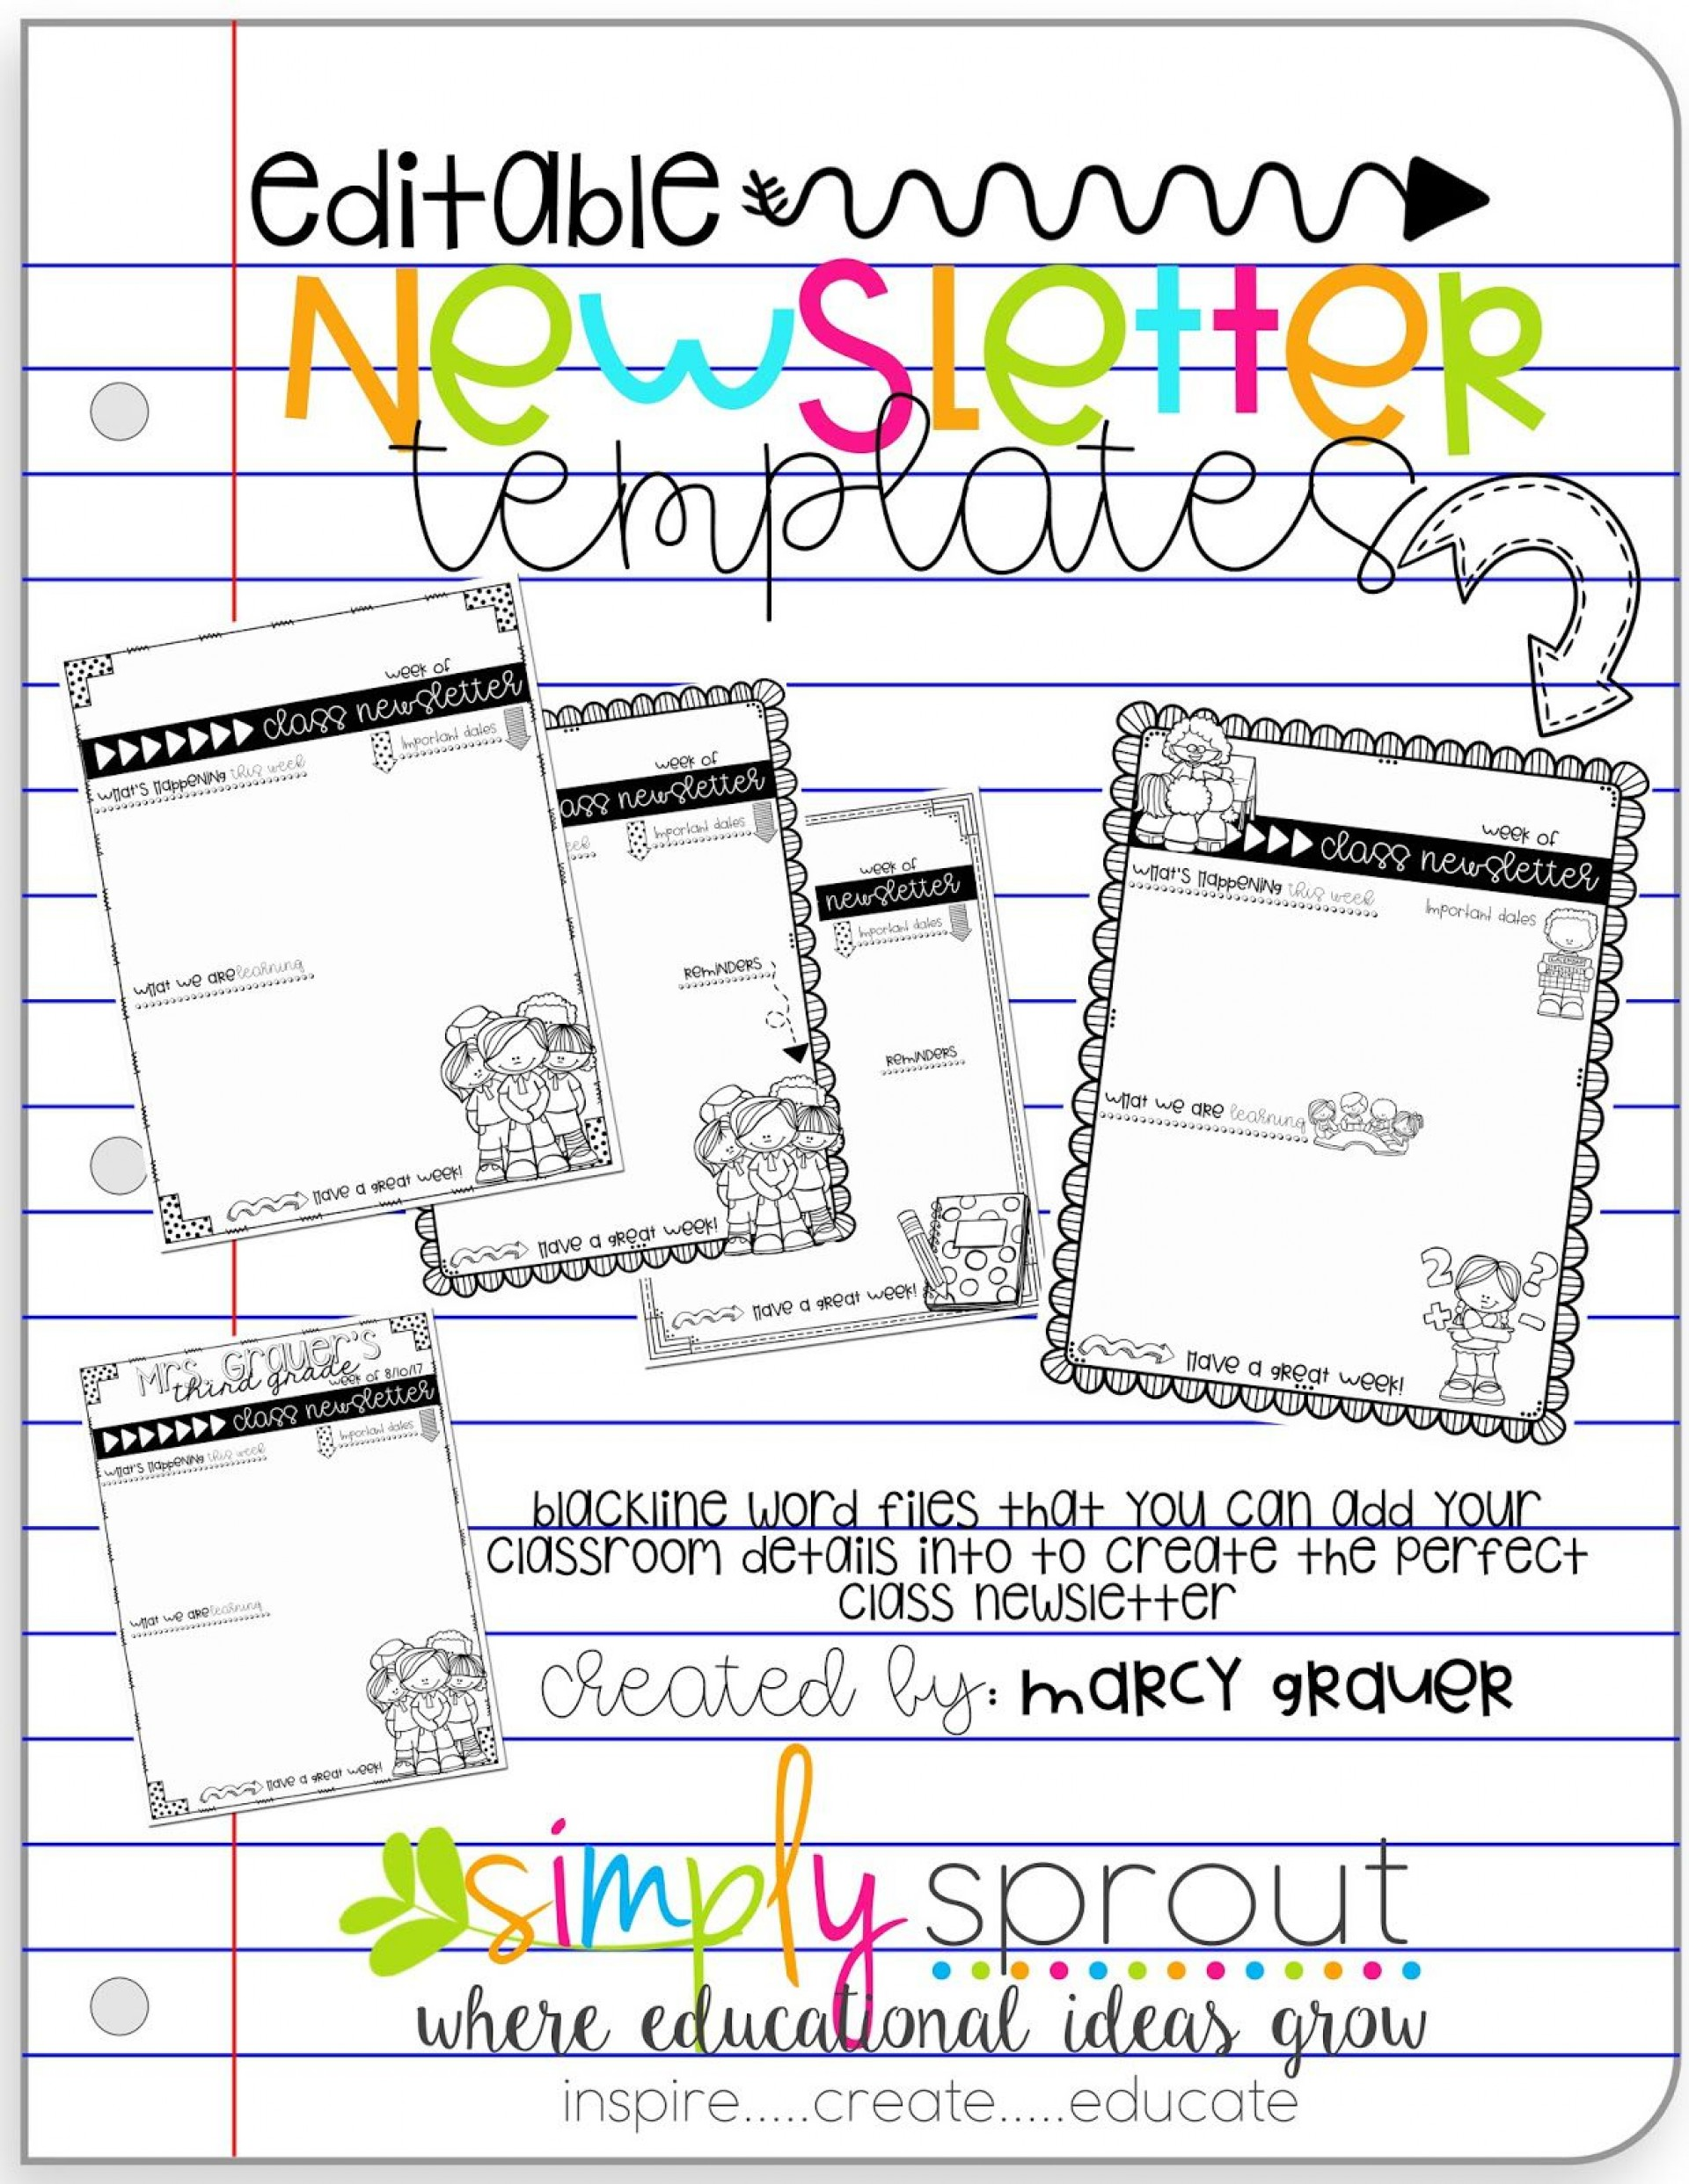 008 Shocking Newsletter Template For Teacher Design  Teachers To Parent Free Printable Digital1920